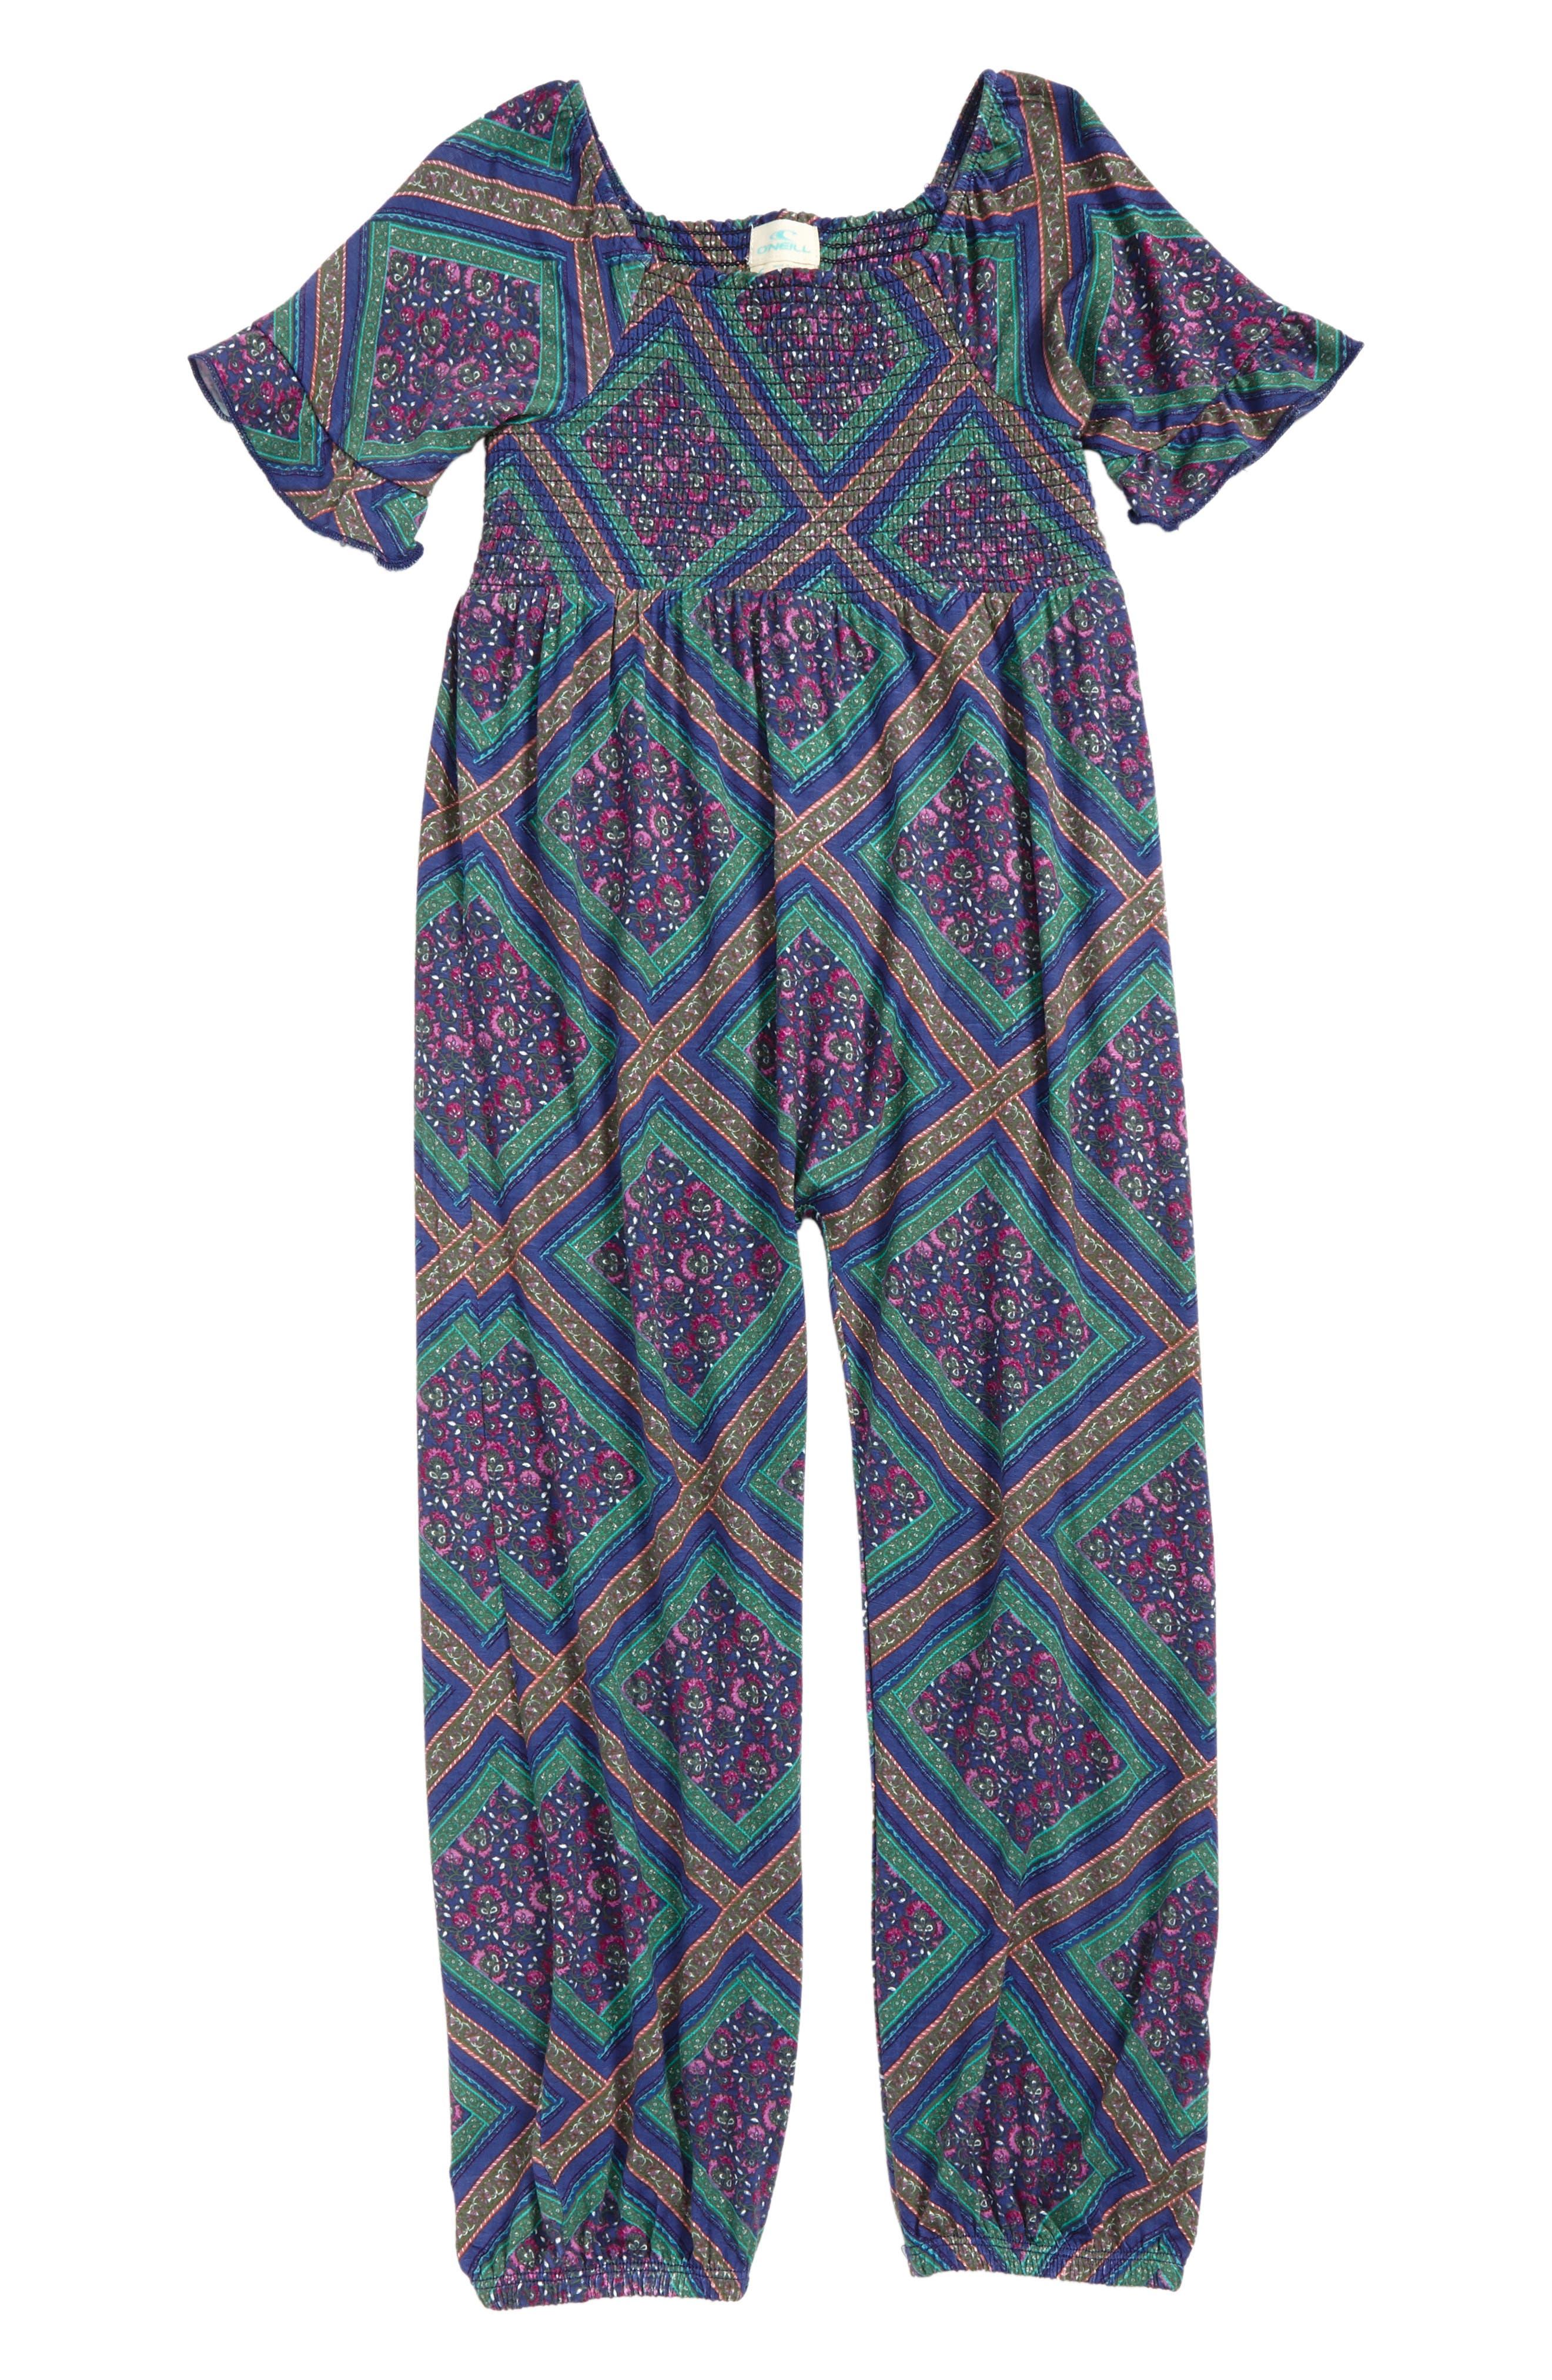 Kelly Knit Jumpsuit,                             Main thumbnail 1, color,                             408